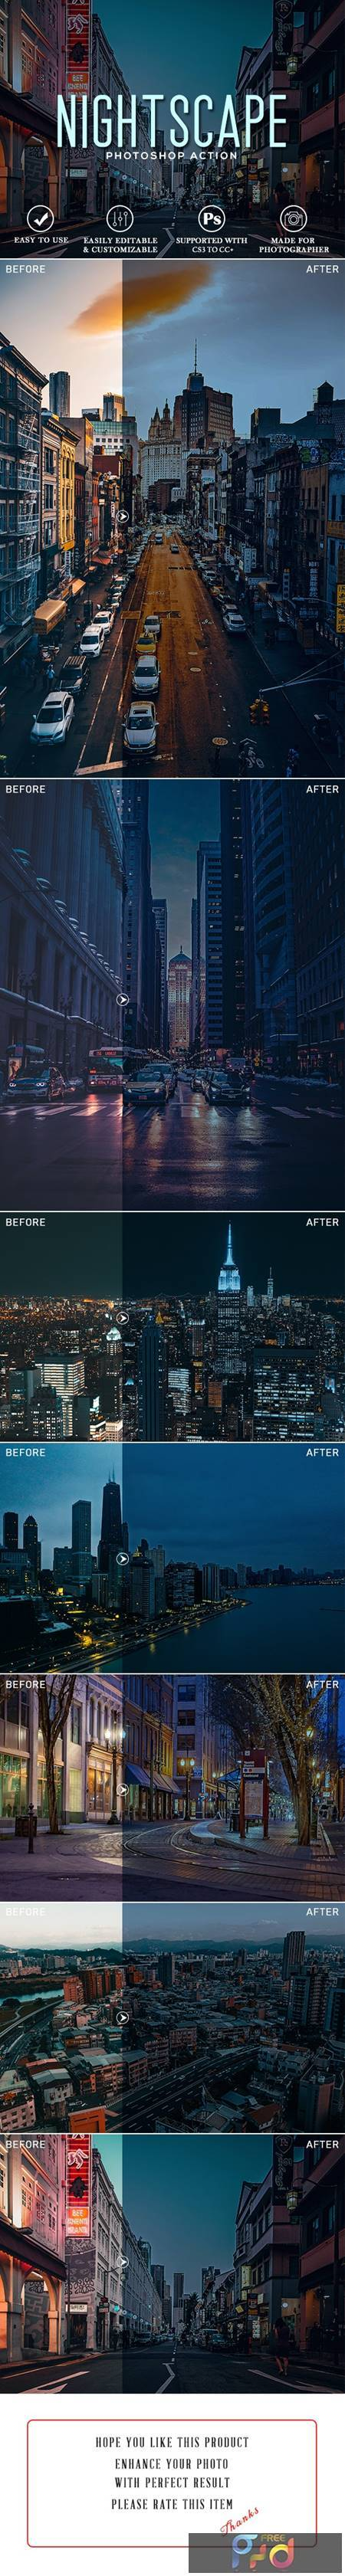 Nightscape Photoshop Action 27482491 1